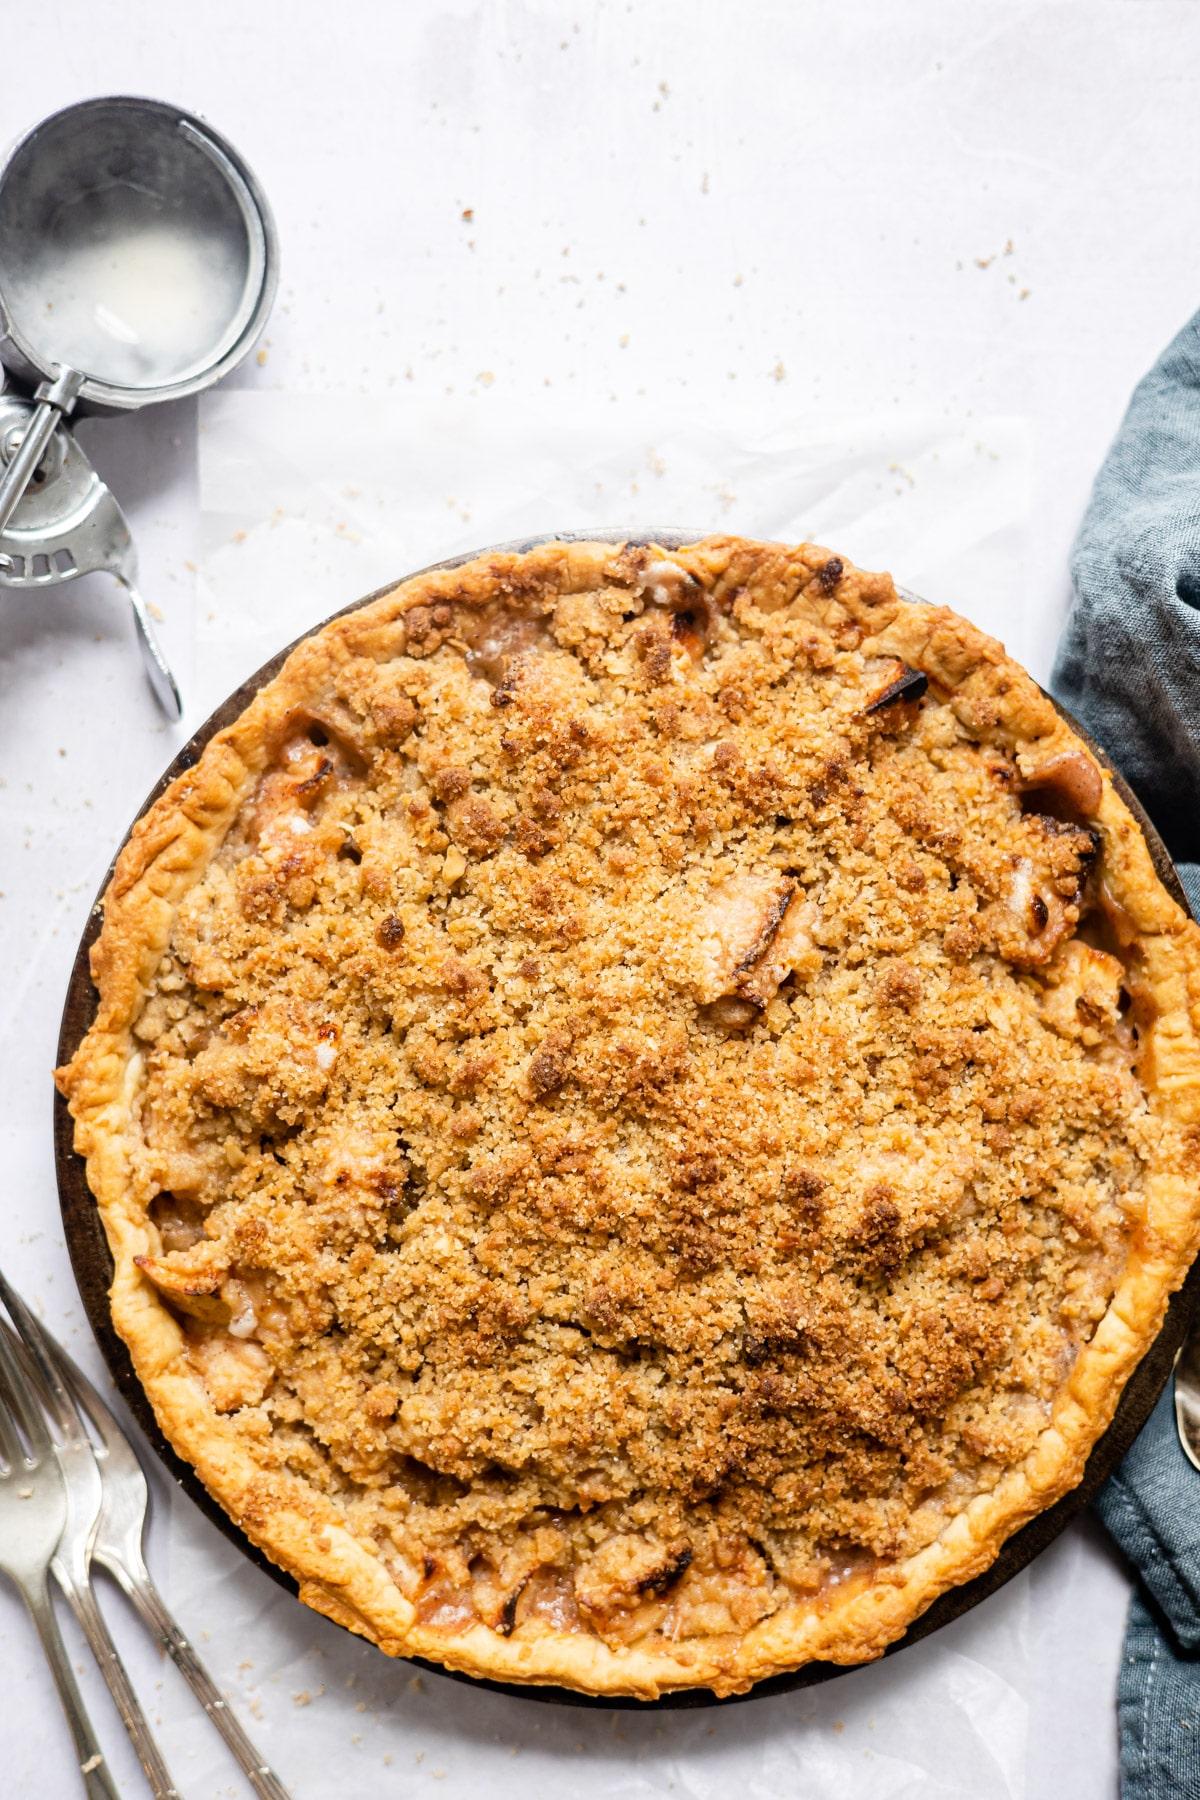 Baked apple crumb pie next to an ice cream scoop.